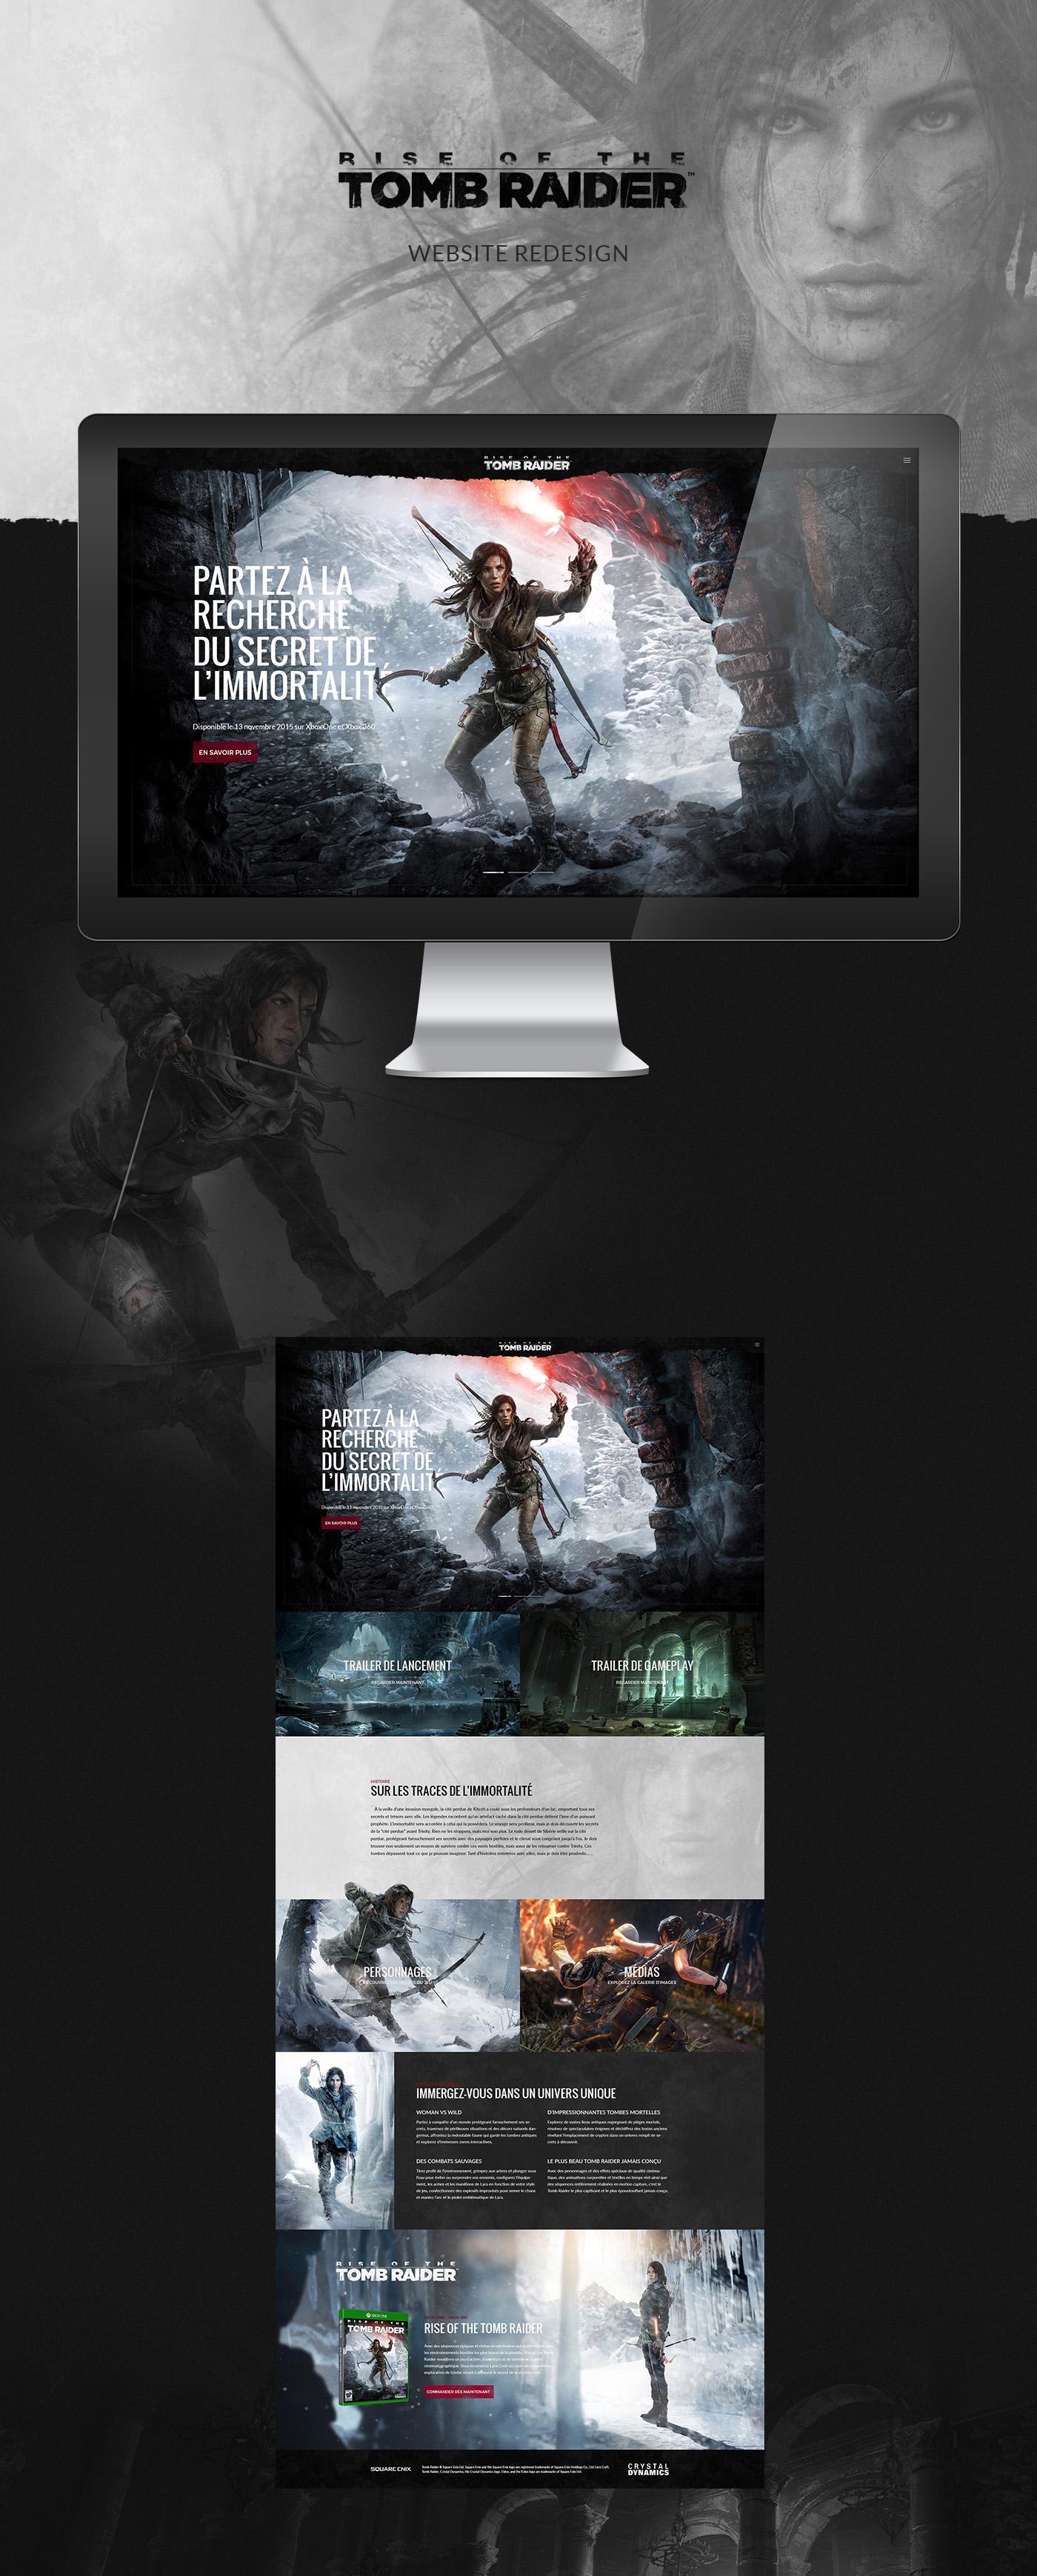 ROTTR tomb raider lara croft square enix Gaming game Games redesign Webdesign rwd rise tomb raider